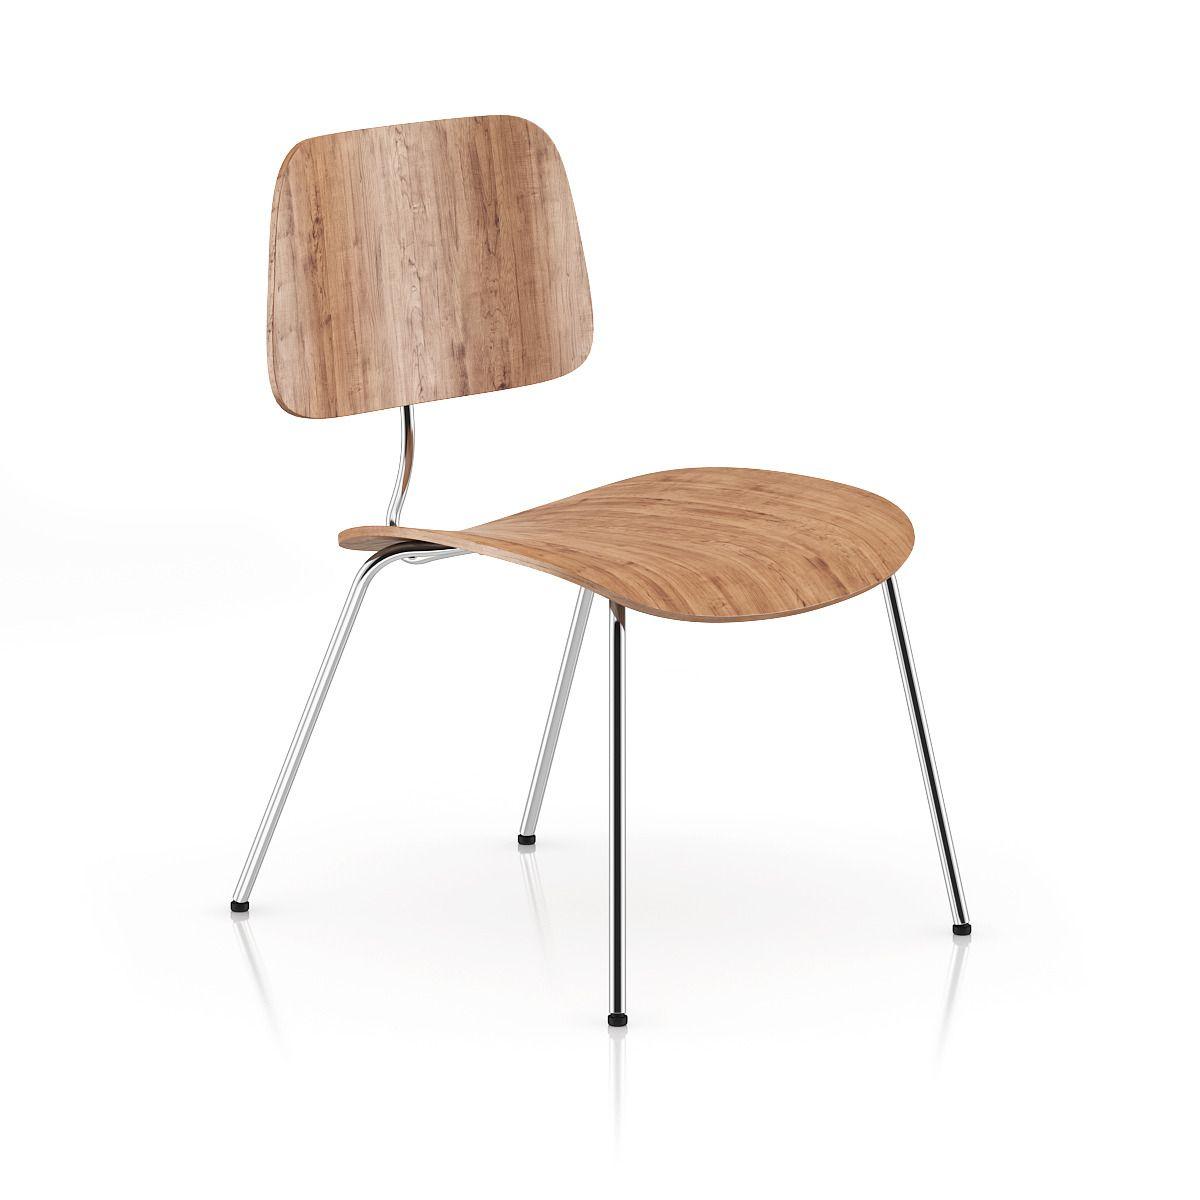 Wooden Chair 1 Wooden Chair Chair Wooden